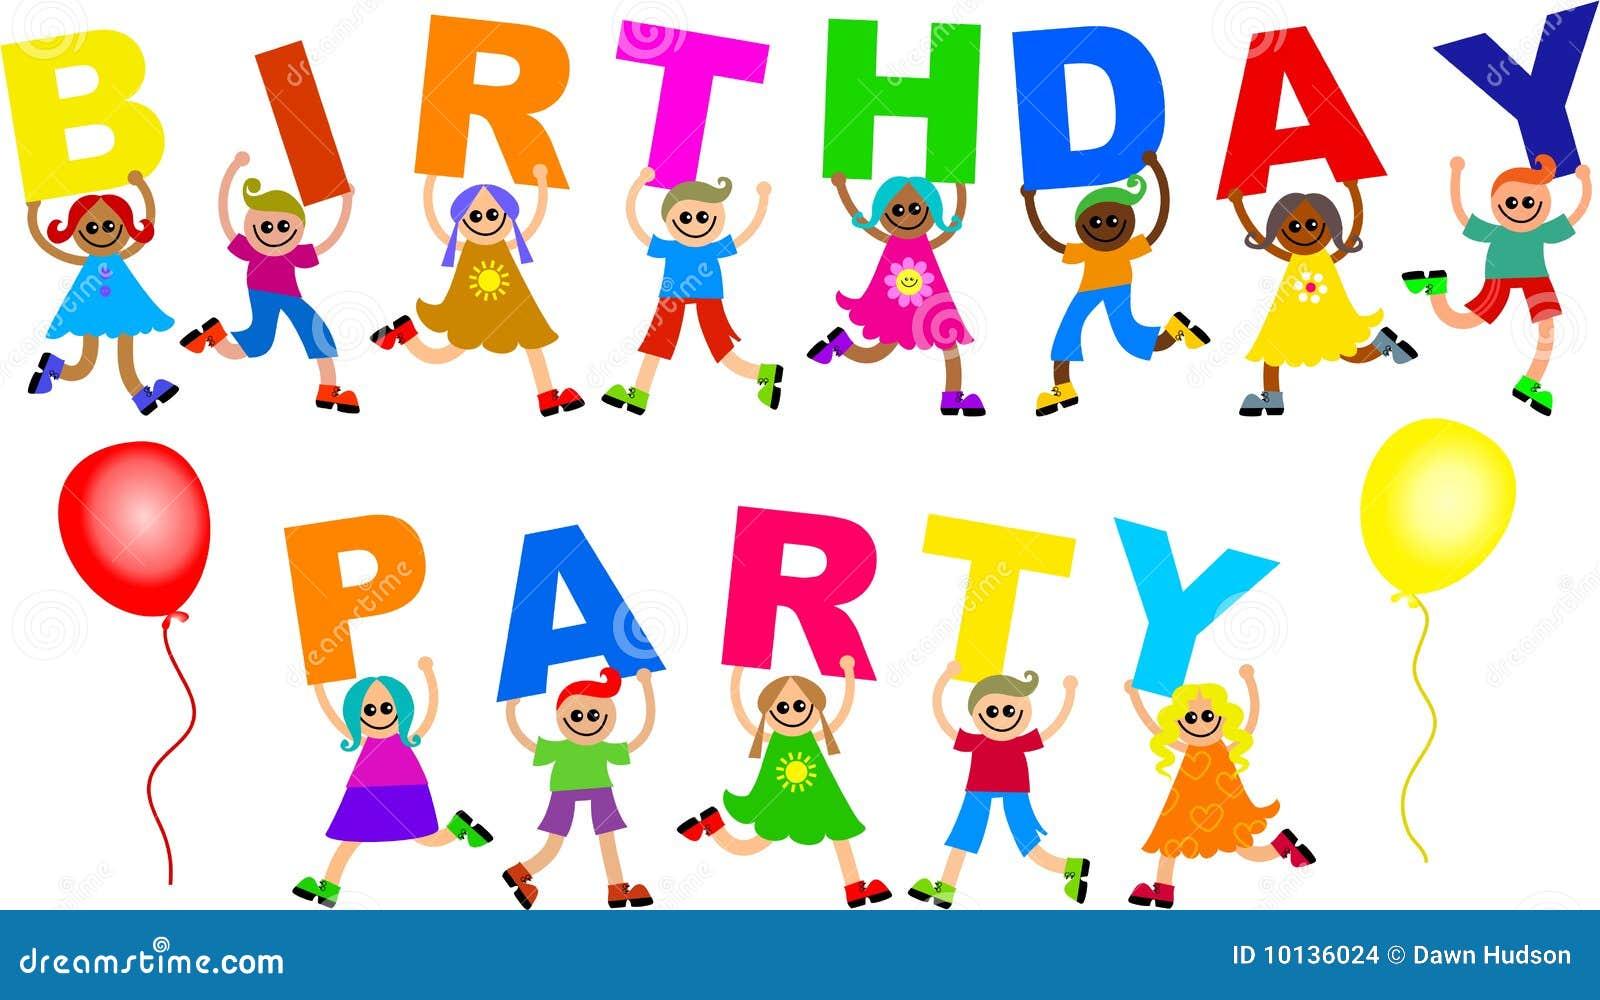 Birthday Party Stock Illustration Illustration Of Happy 10136024